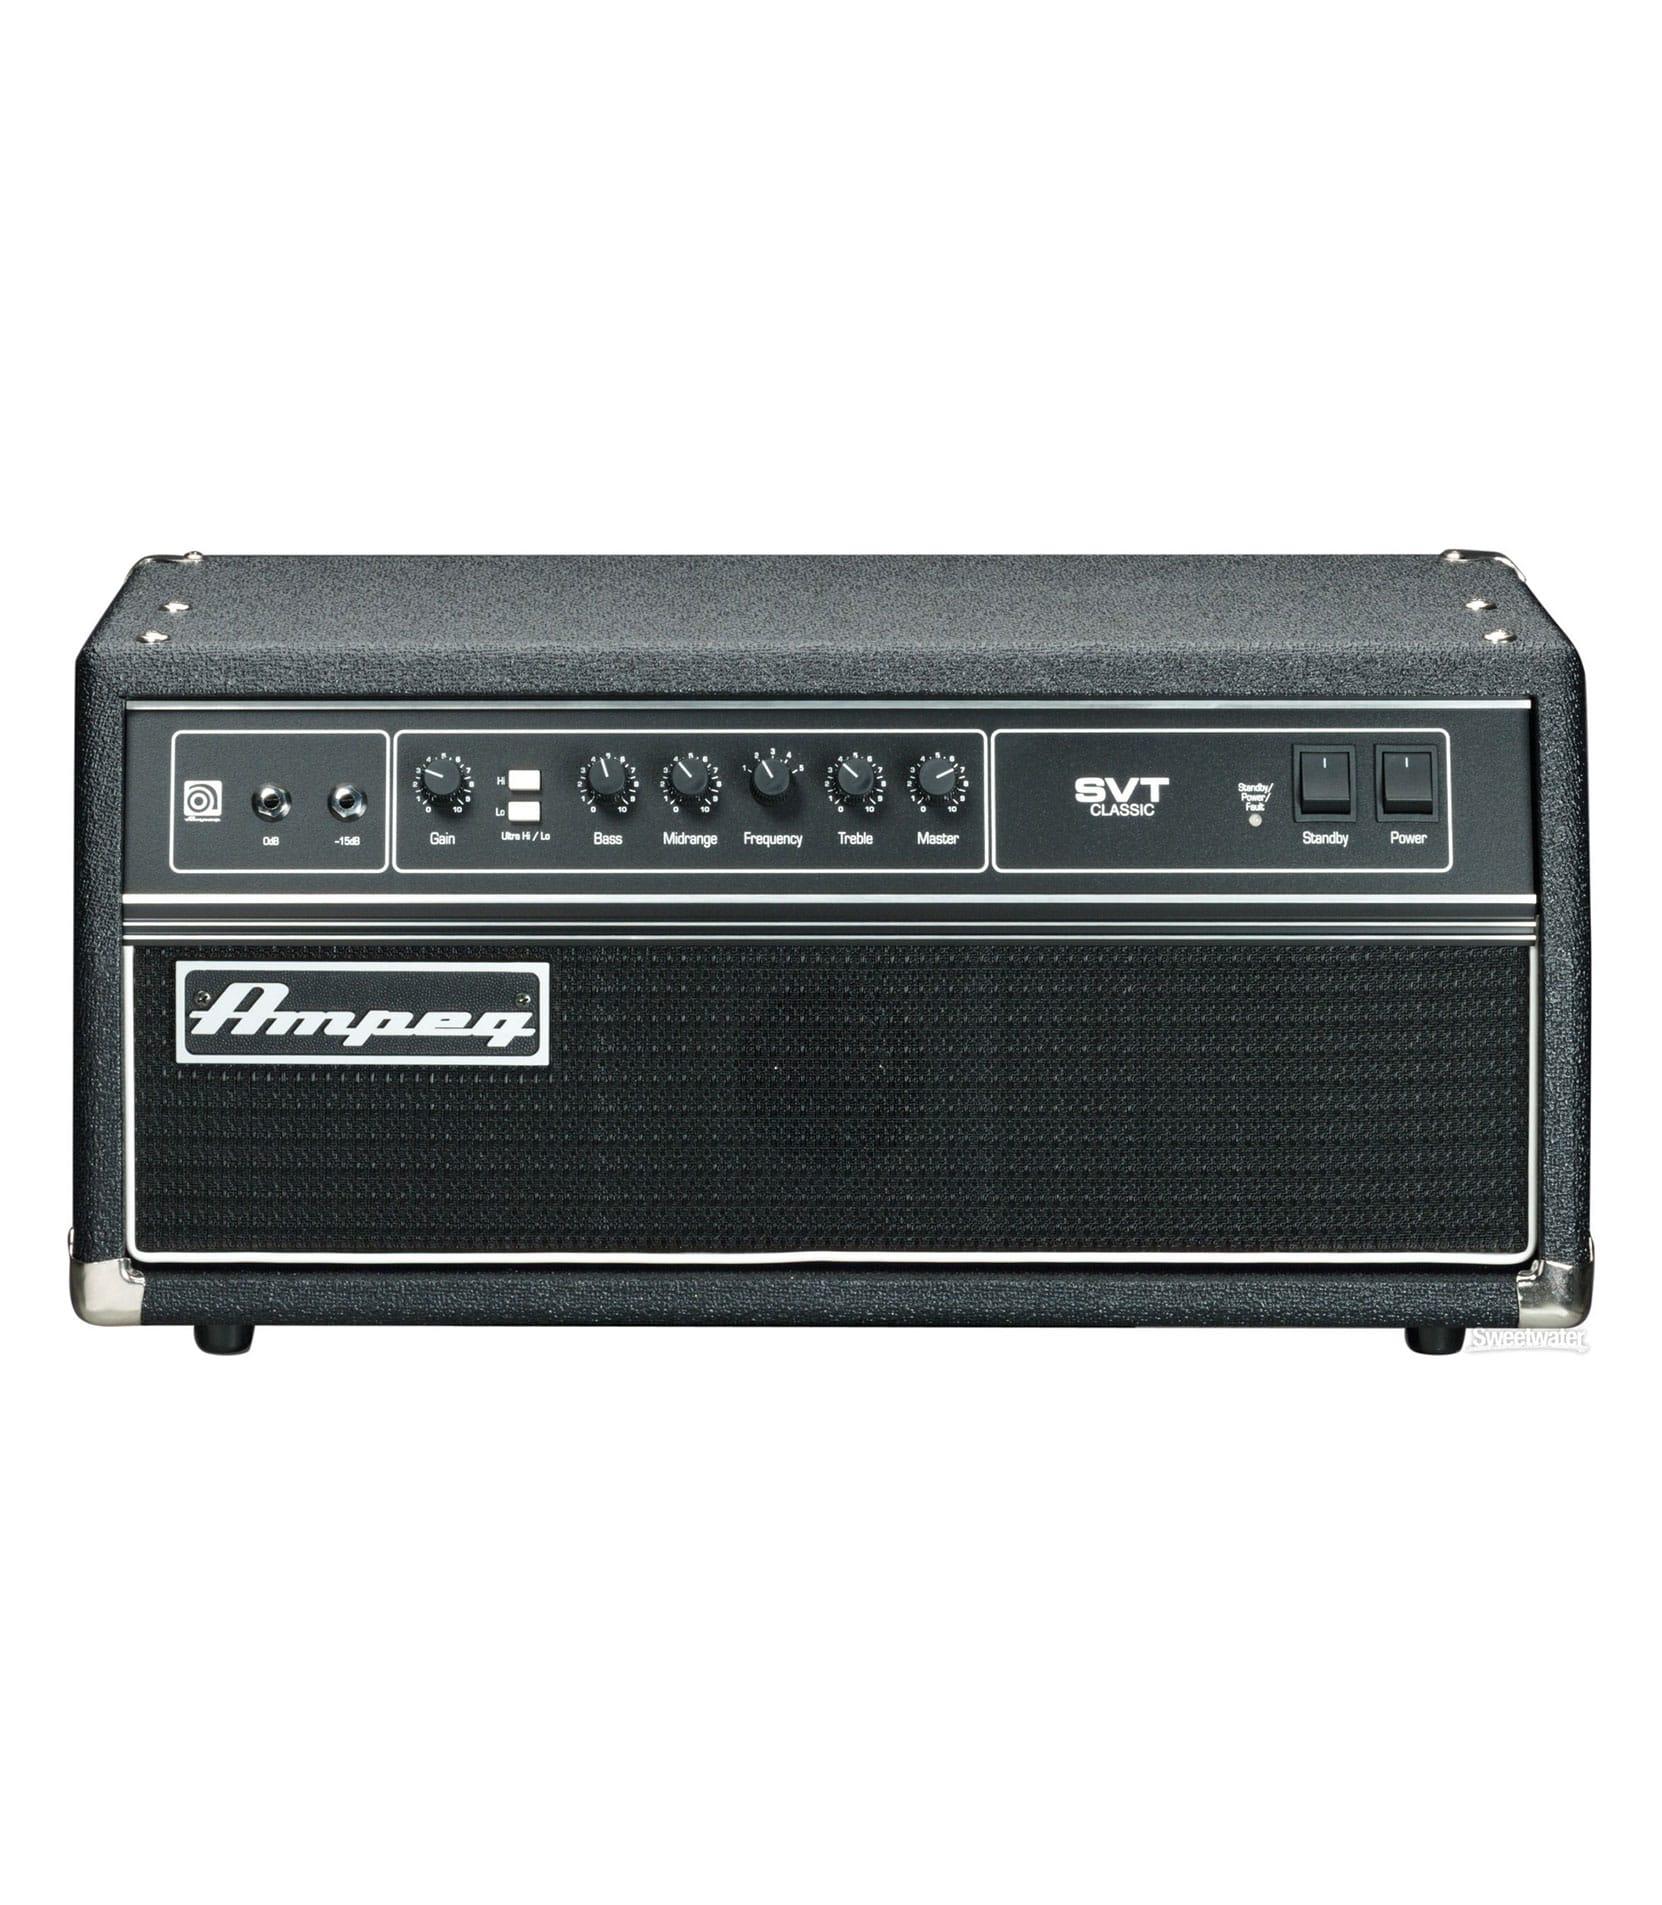 buy ampeg svt cl 300 watt classic bass head all tube